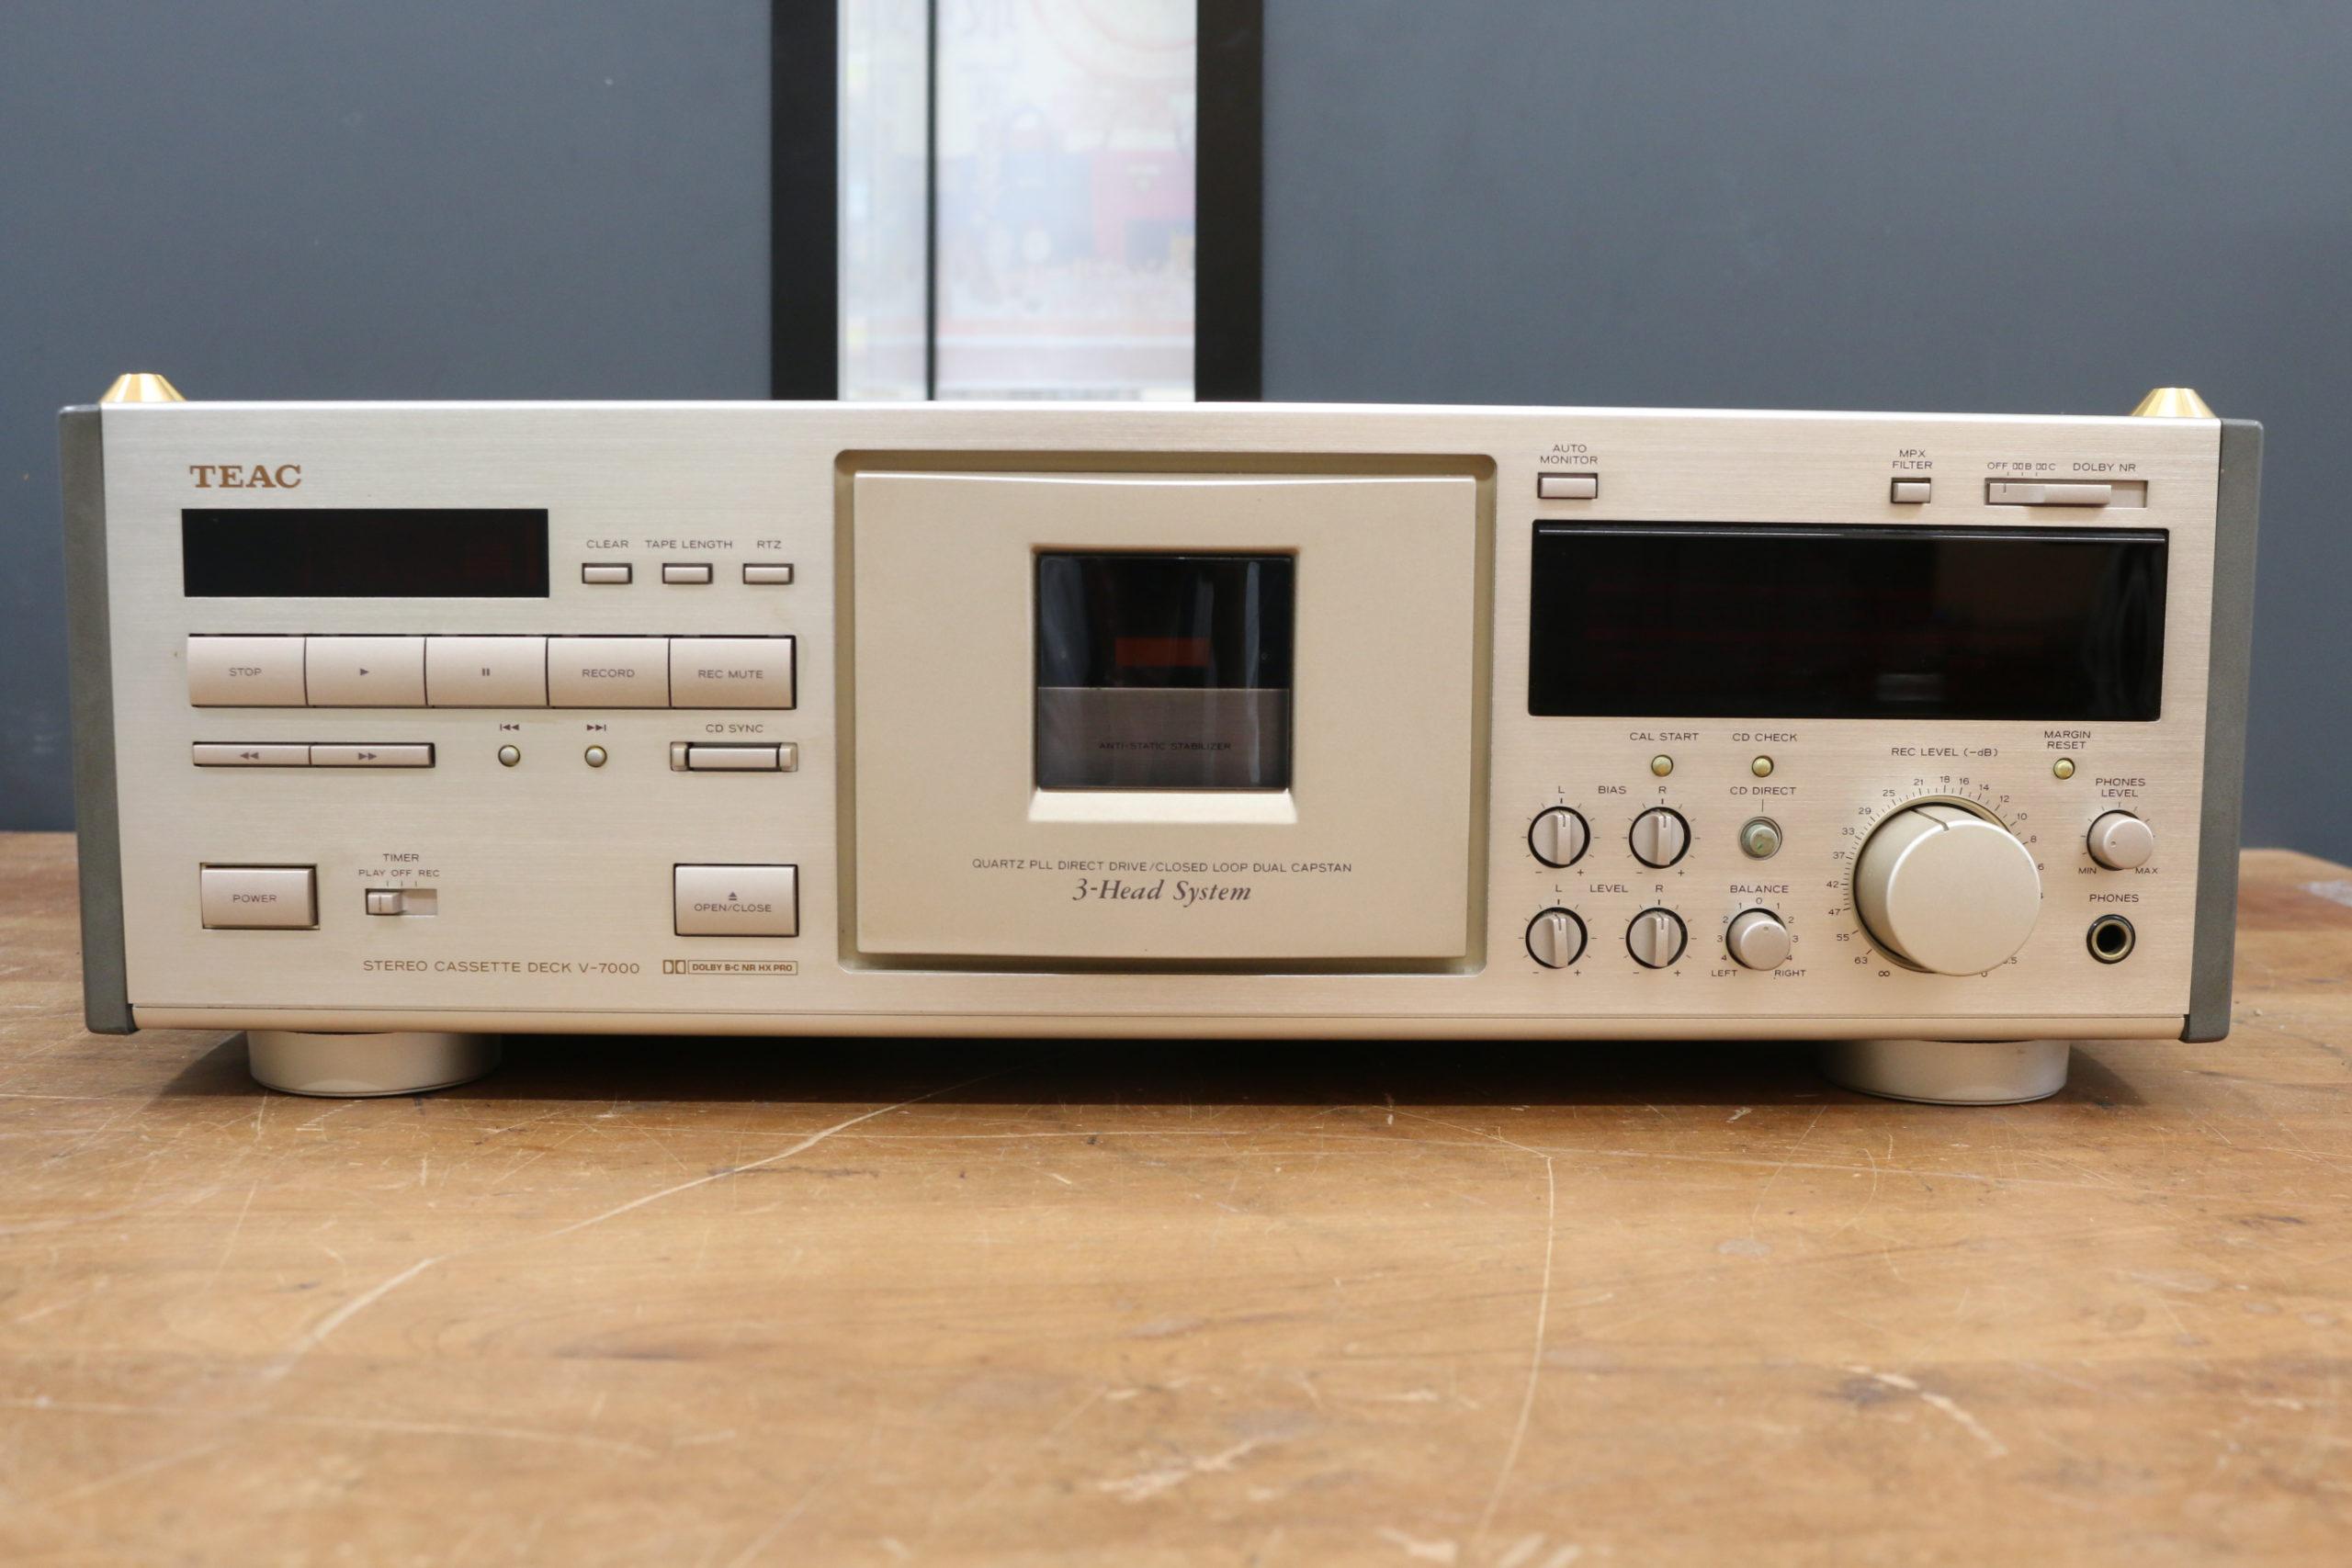 TEAC/ティアック V-7000 3ヘッド ステレオカセットデッキ オーディオ機器を買取させて頂きました!!の買取-